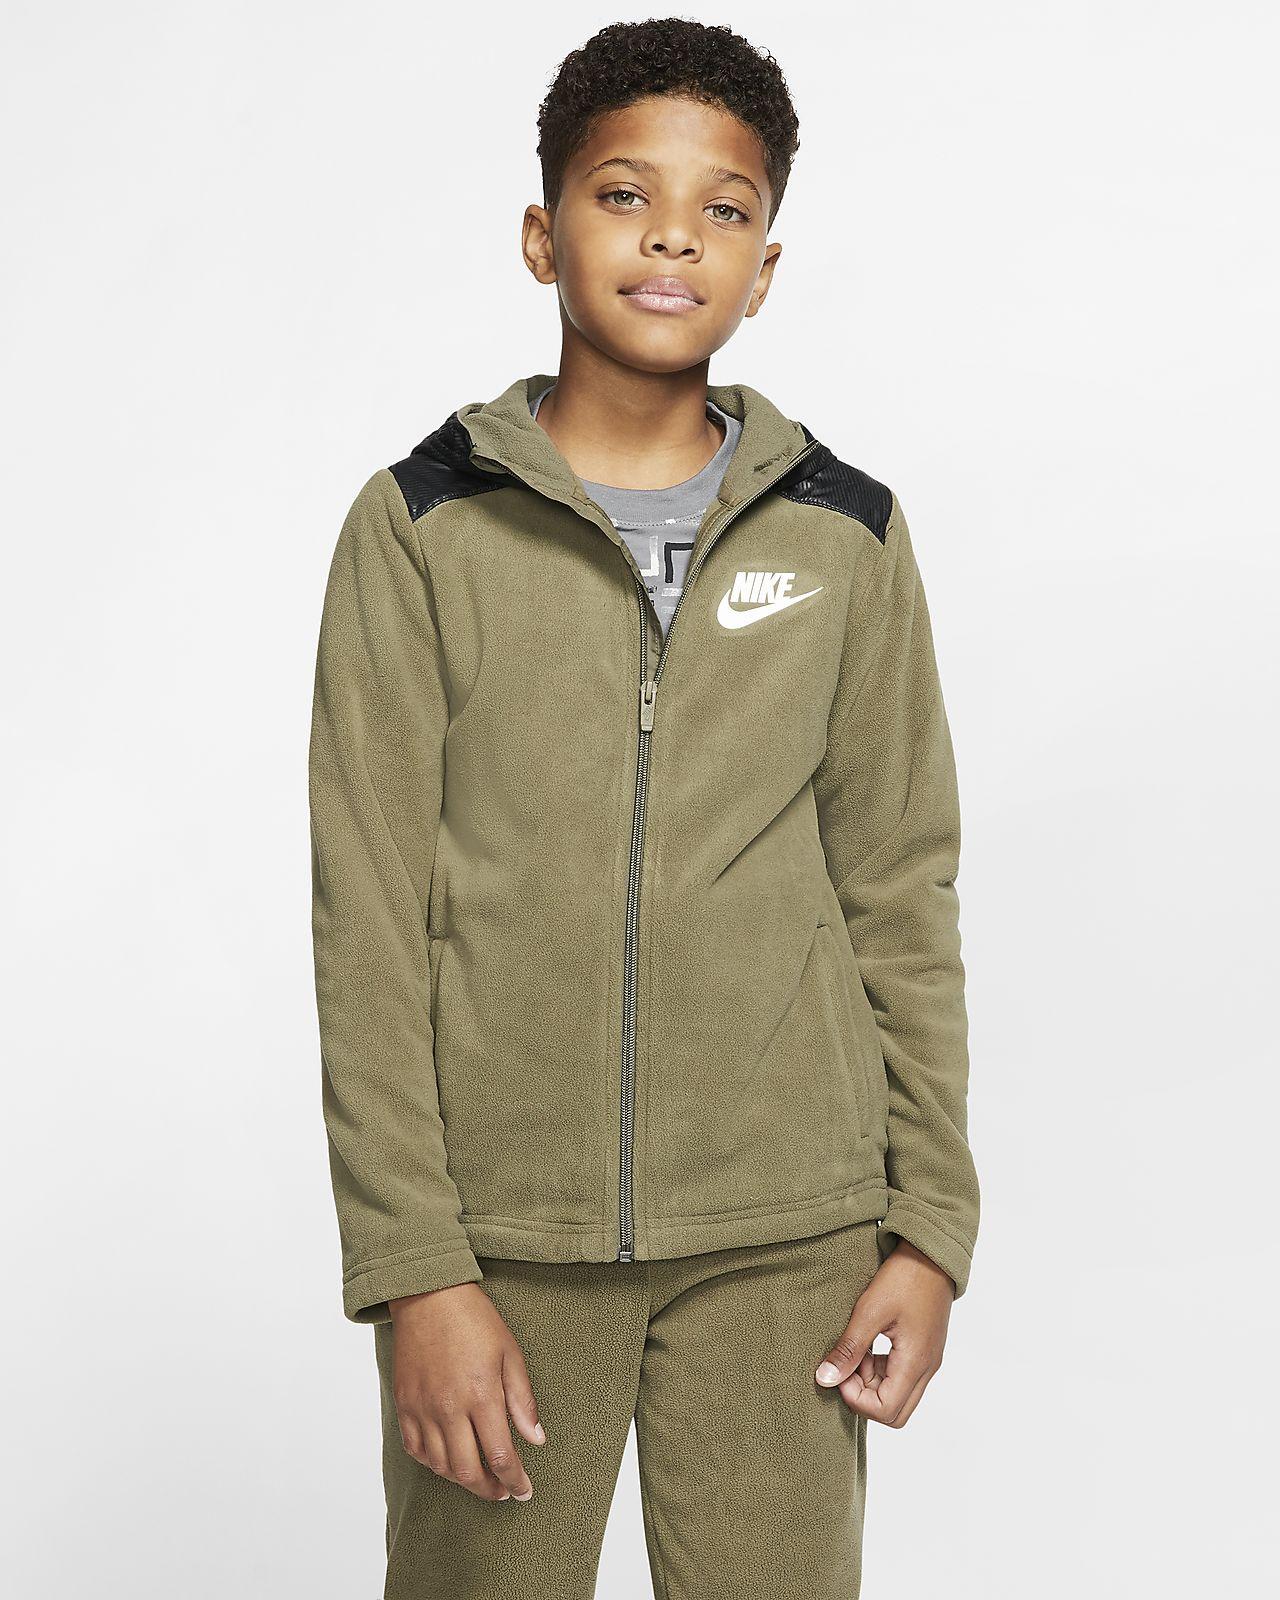 Hoodie com fecho completo Nike Sportswear Winterized Júnior (Rapaz)